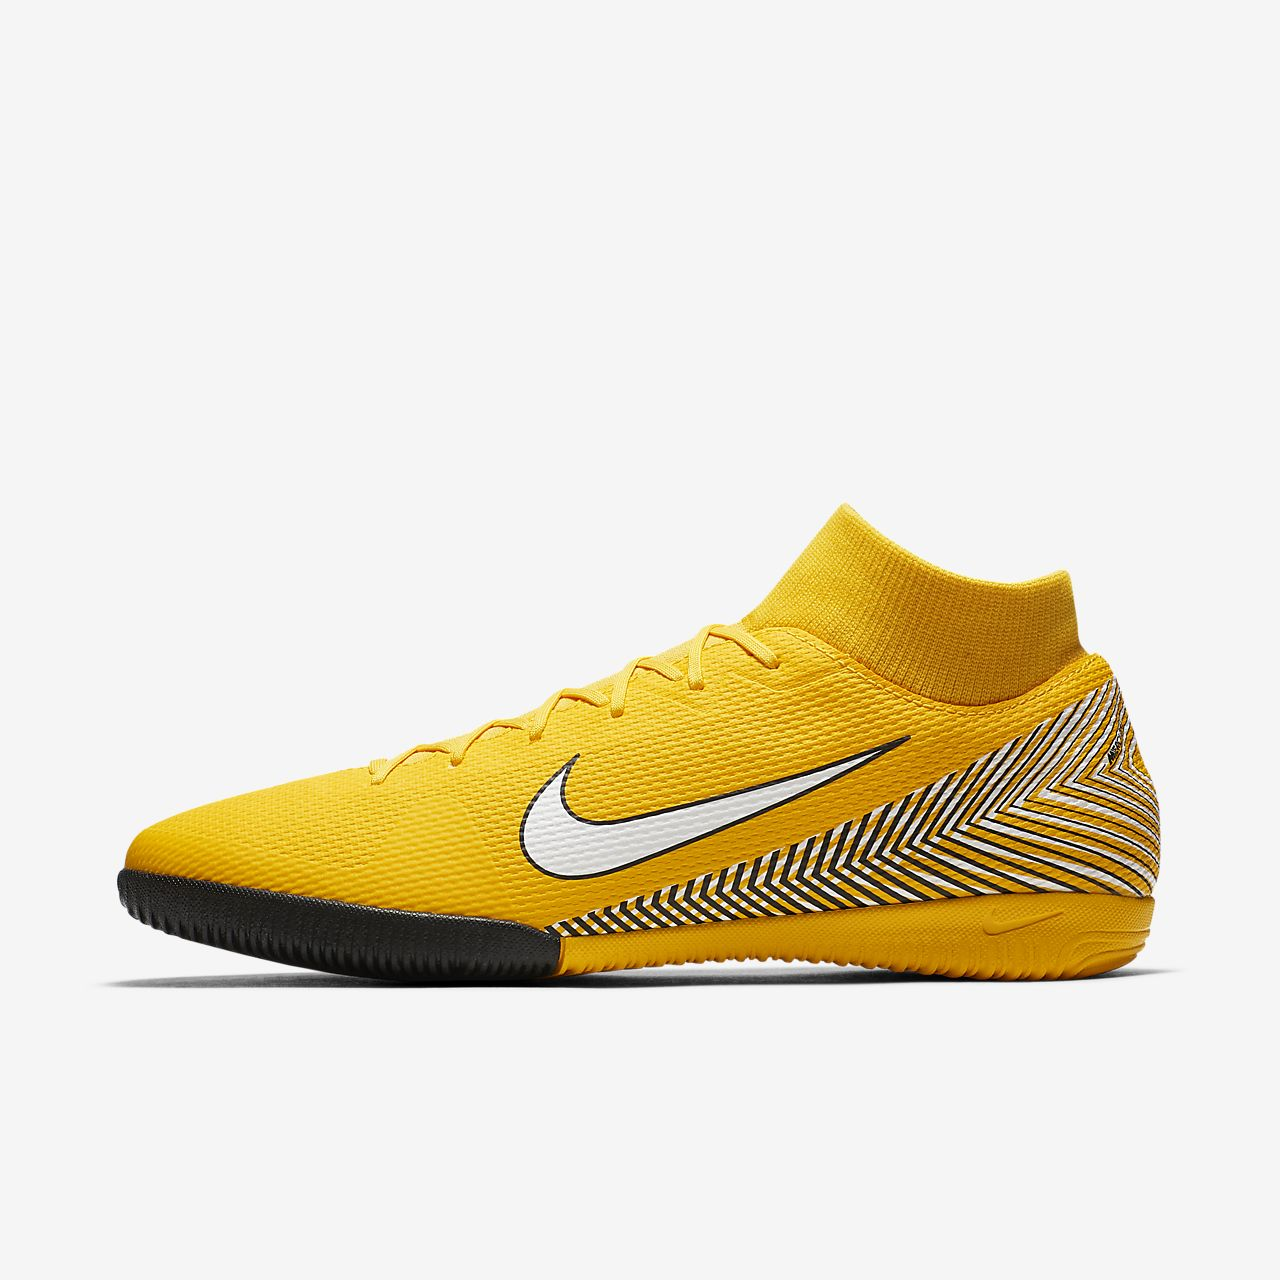 309c1f486 shopping nike mercurial superfly vi academy neymar jr. indoor court  football boot 3bdf1 a4ab7